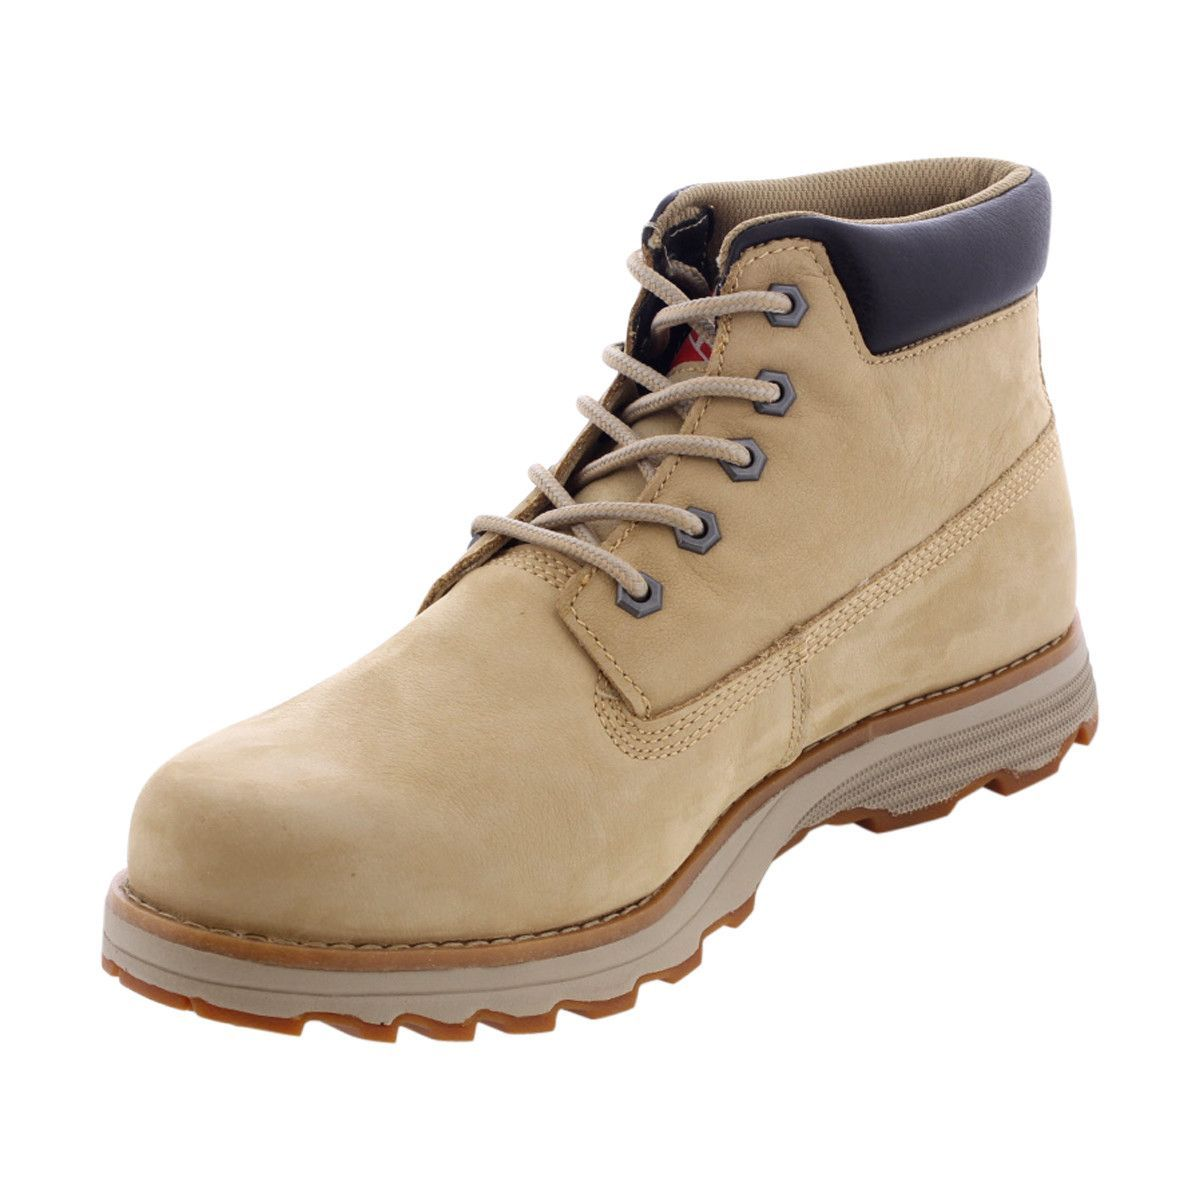 a7cb762bd84 Caterpillar - Men s Low Founder Boots - Latte